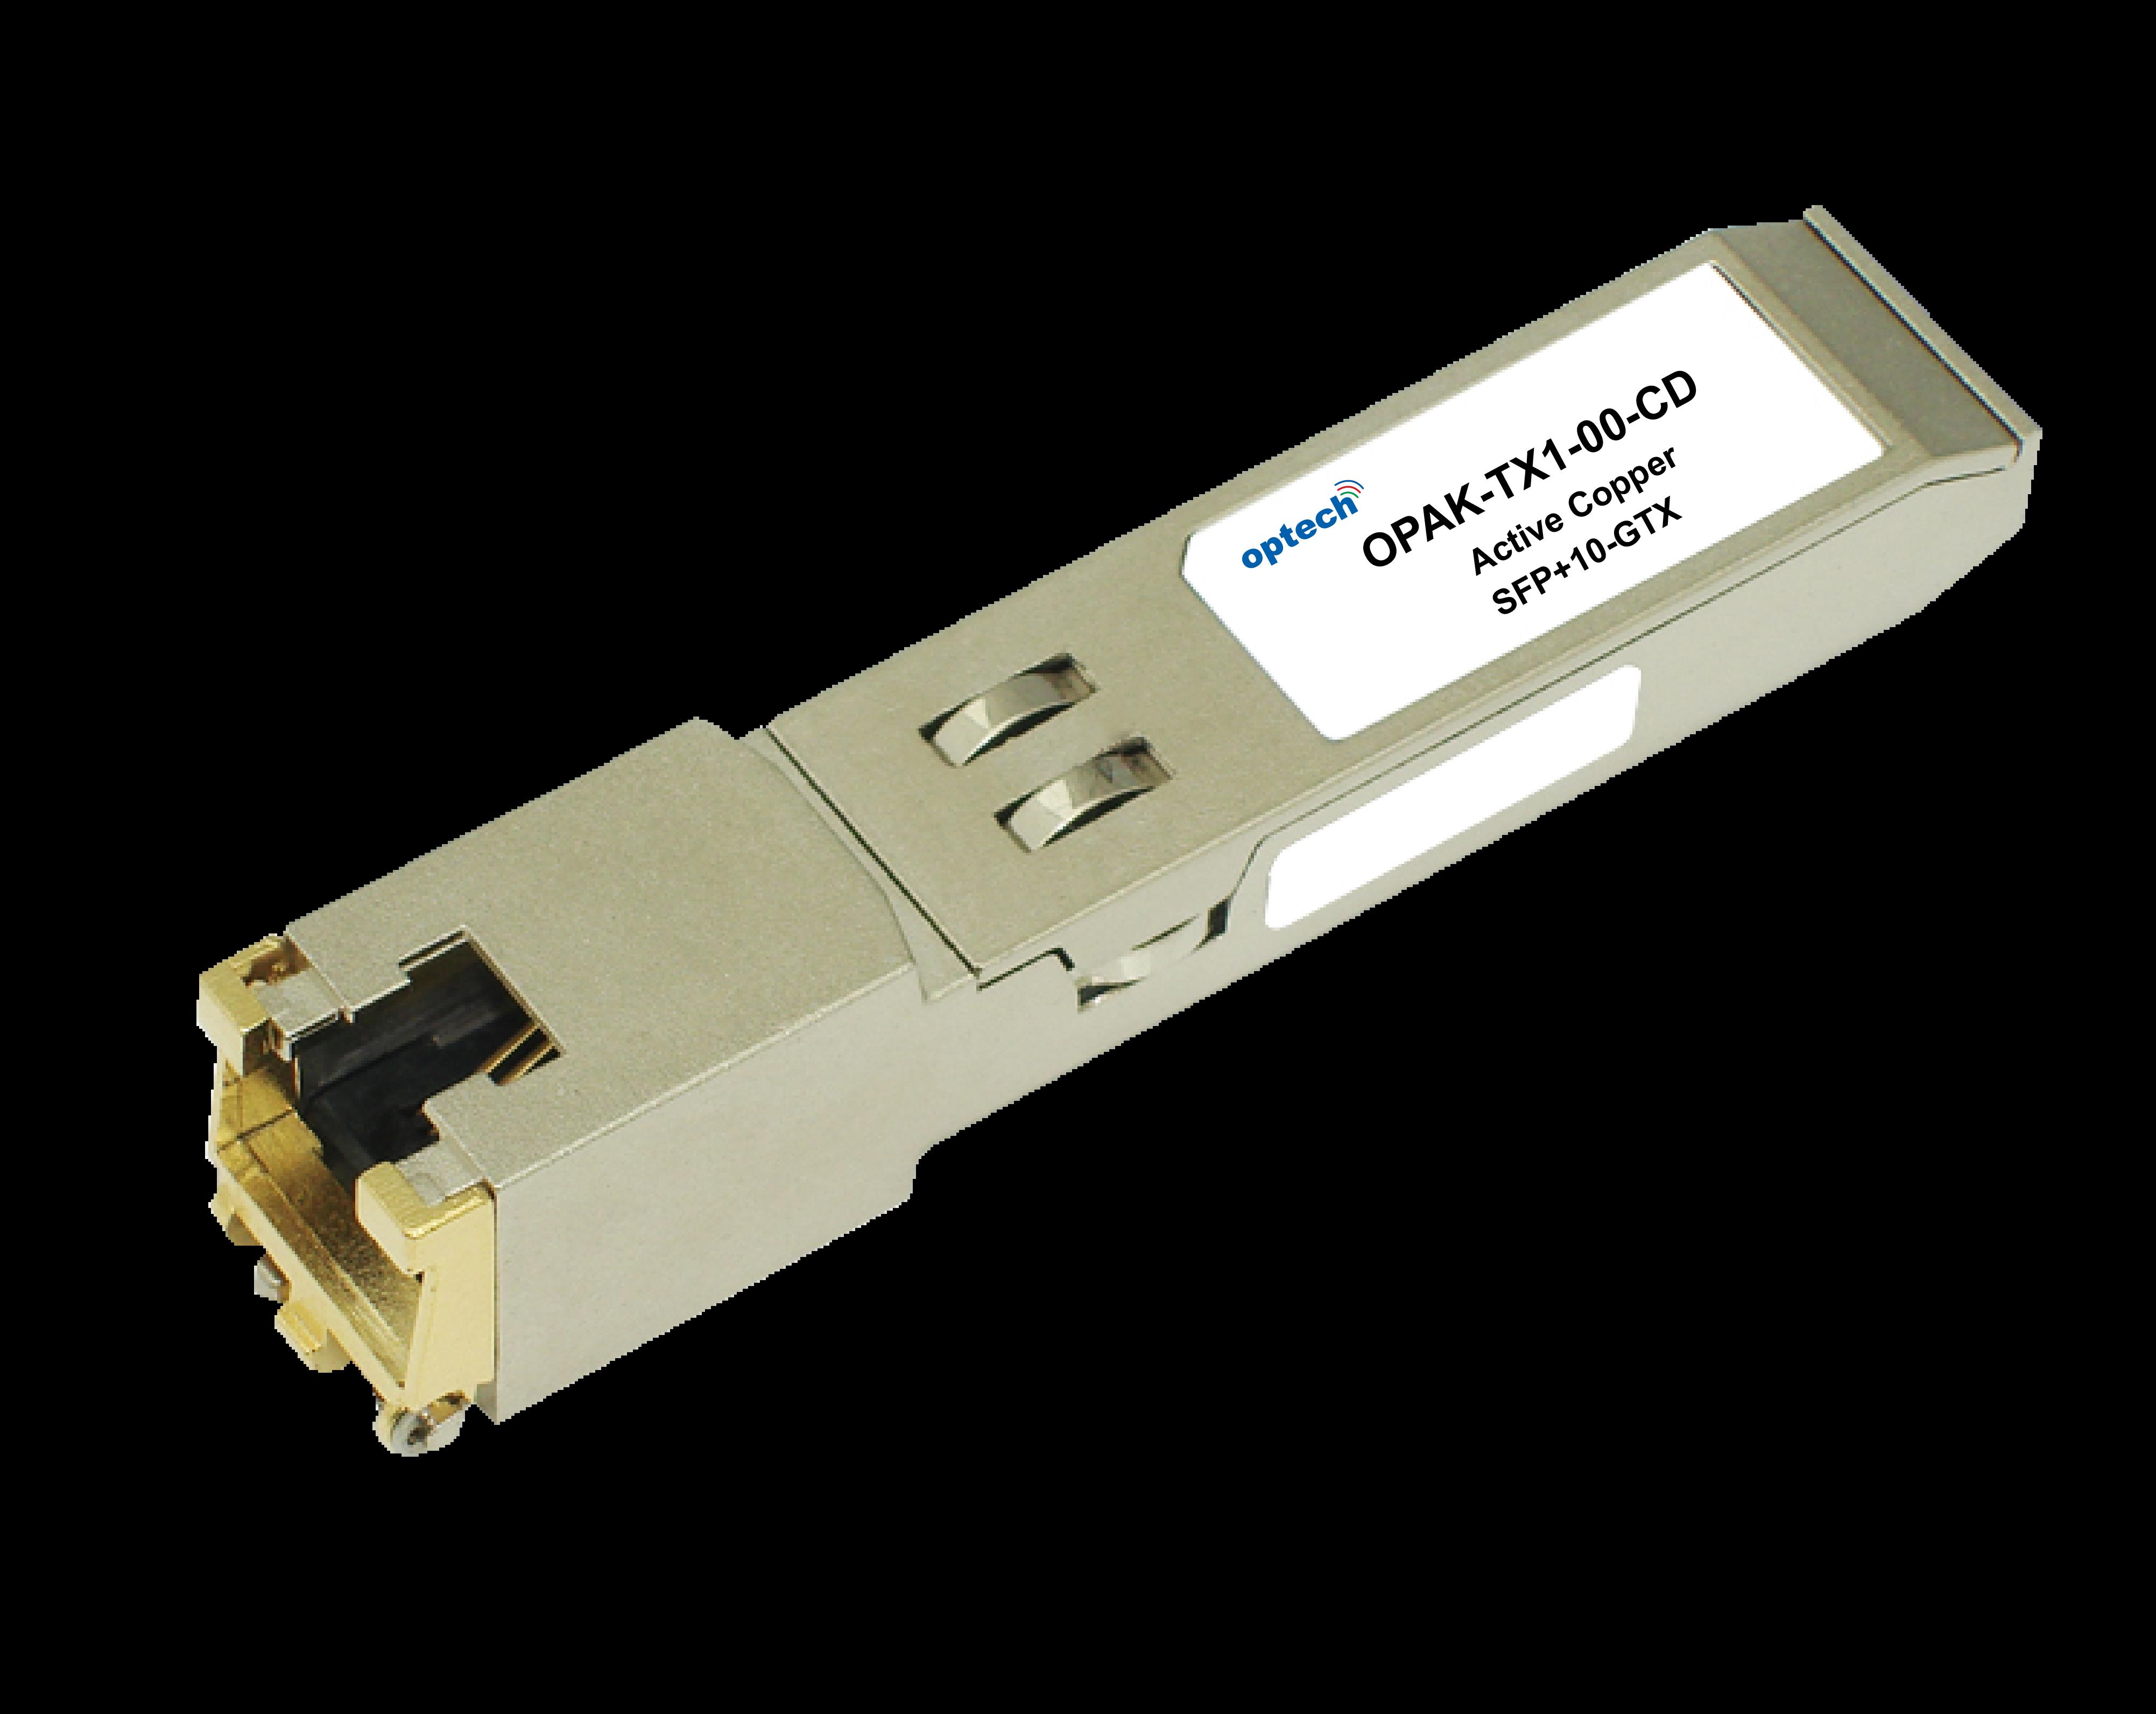 SFP+ 10GBASE TX COPPER RJ45 MODULE 30M OPTICAL TRANSCEIVER OPAK-TX1-00-CD